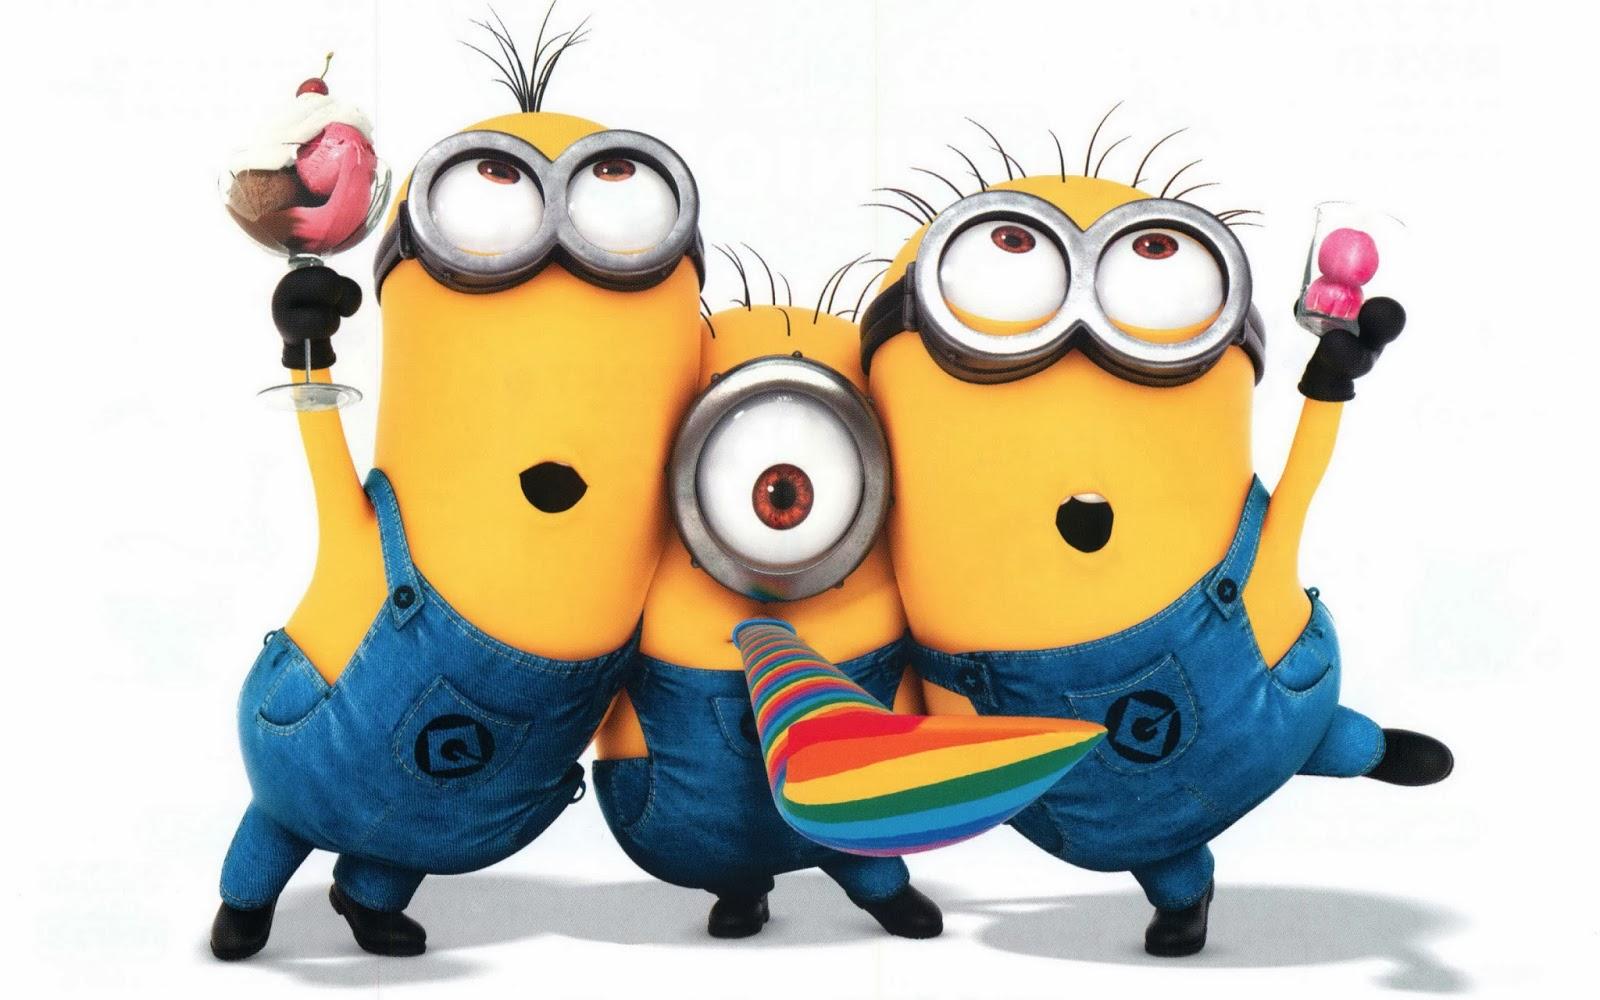 ilulz Blog: [ilulz Station] I am Happy - Stay Hyper!